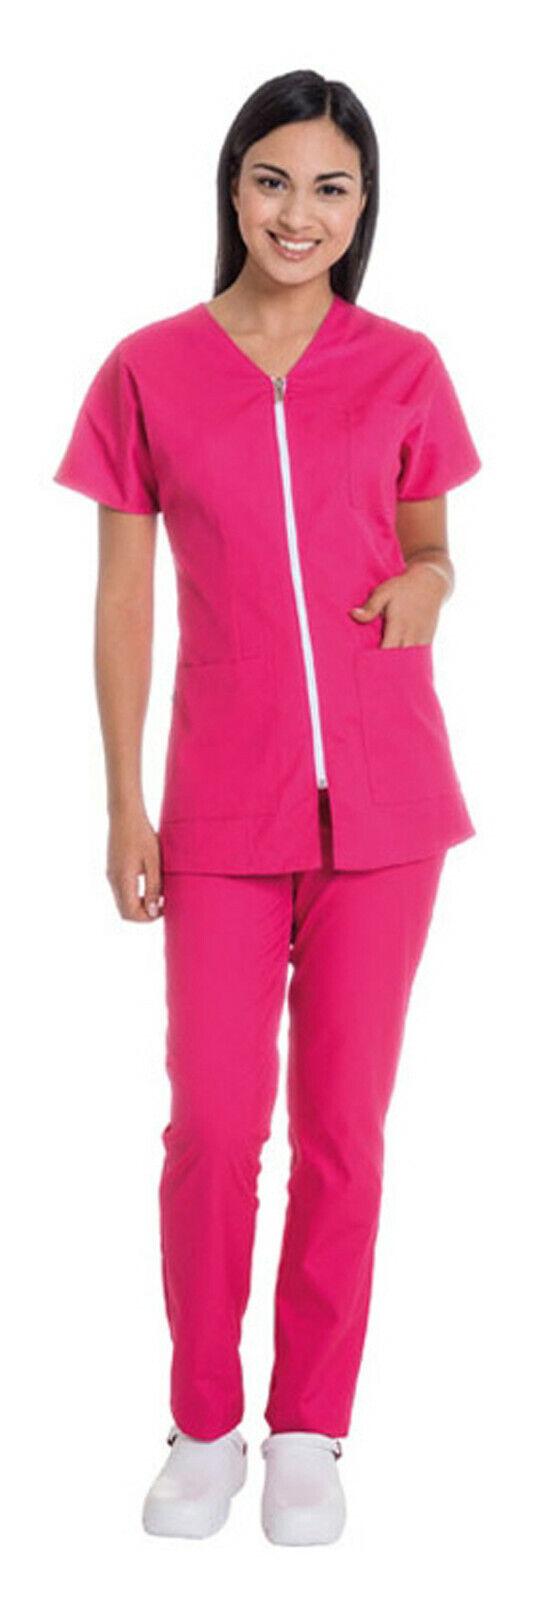 Divisa Sanitaria Donna Casacca Pantaloni Pantaloni Pantaloni Ospedale Infermiera Completo Estetica 92d124